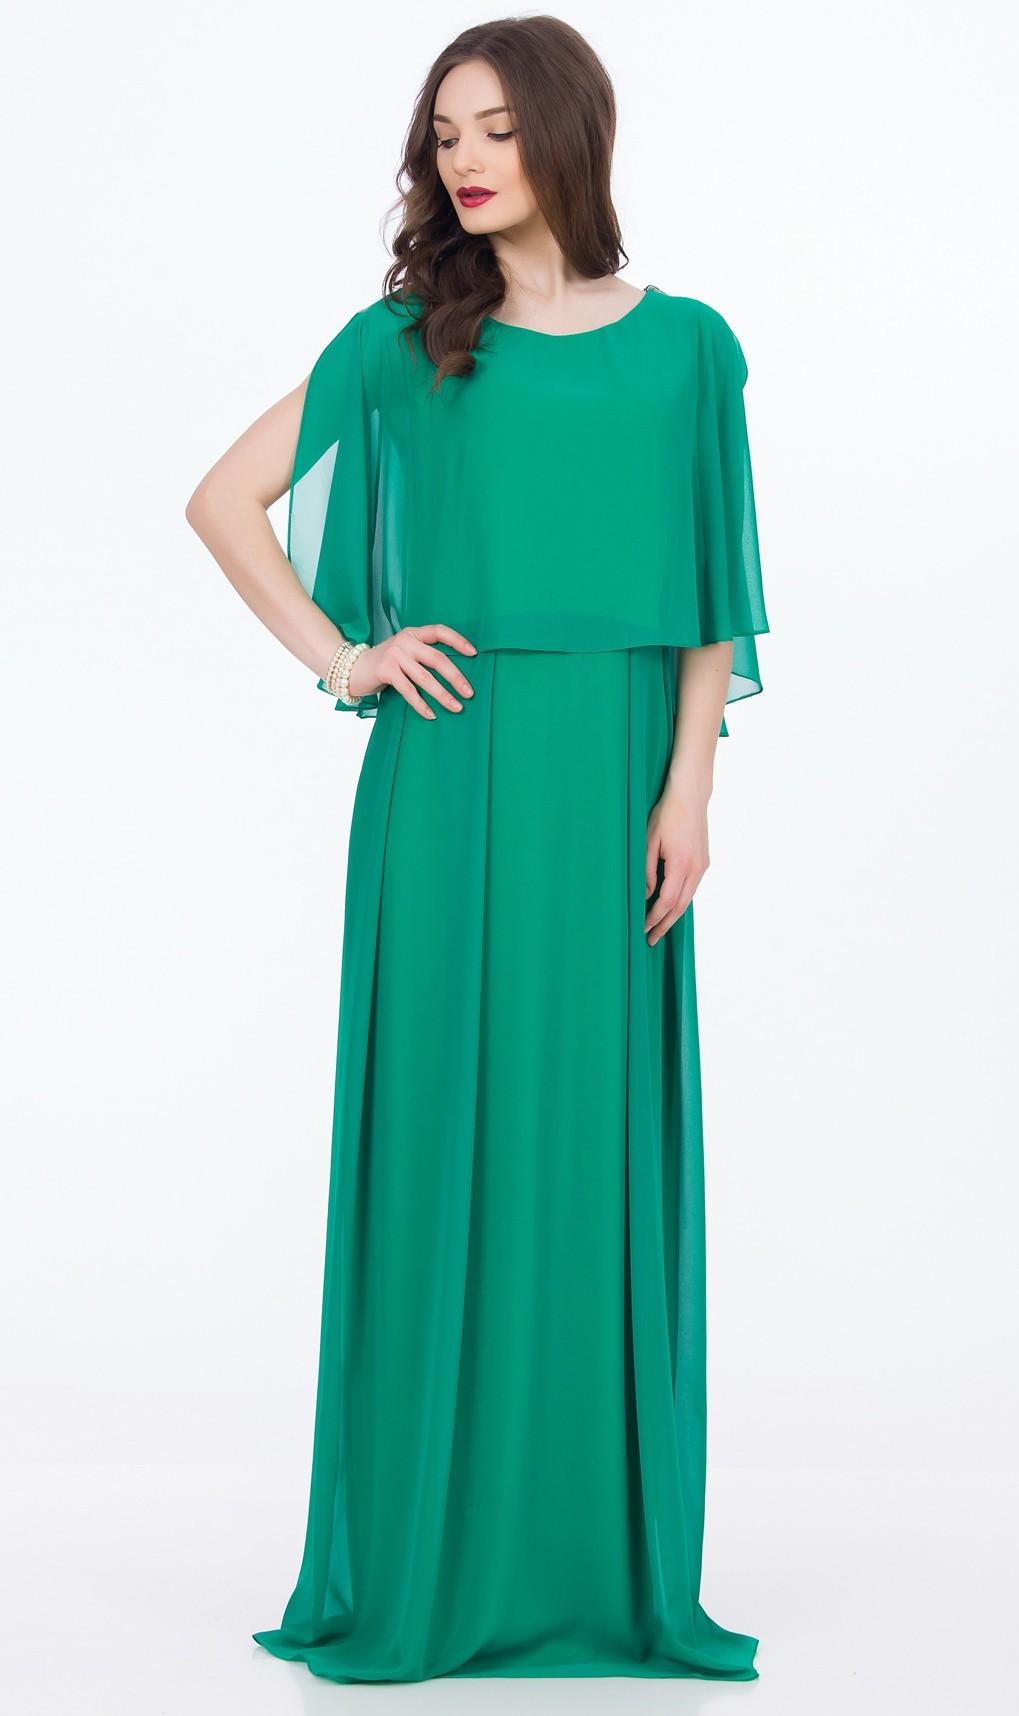 rochie-verde-lunga-sense